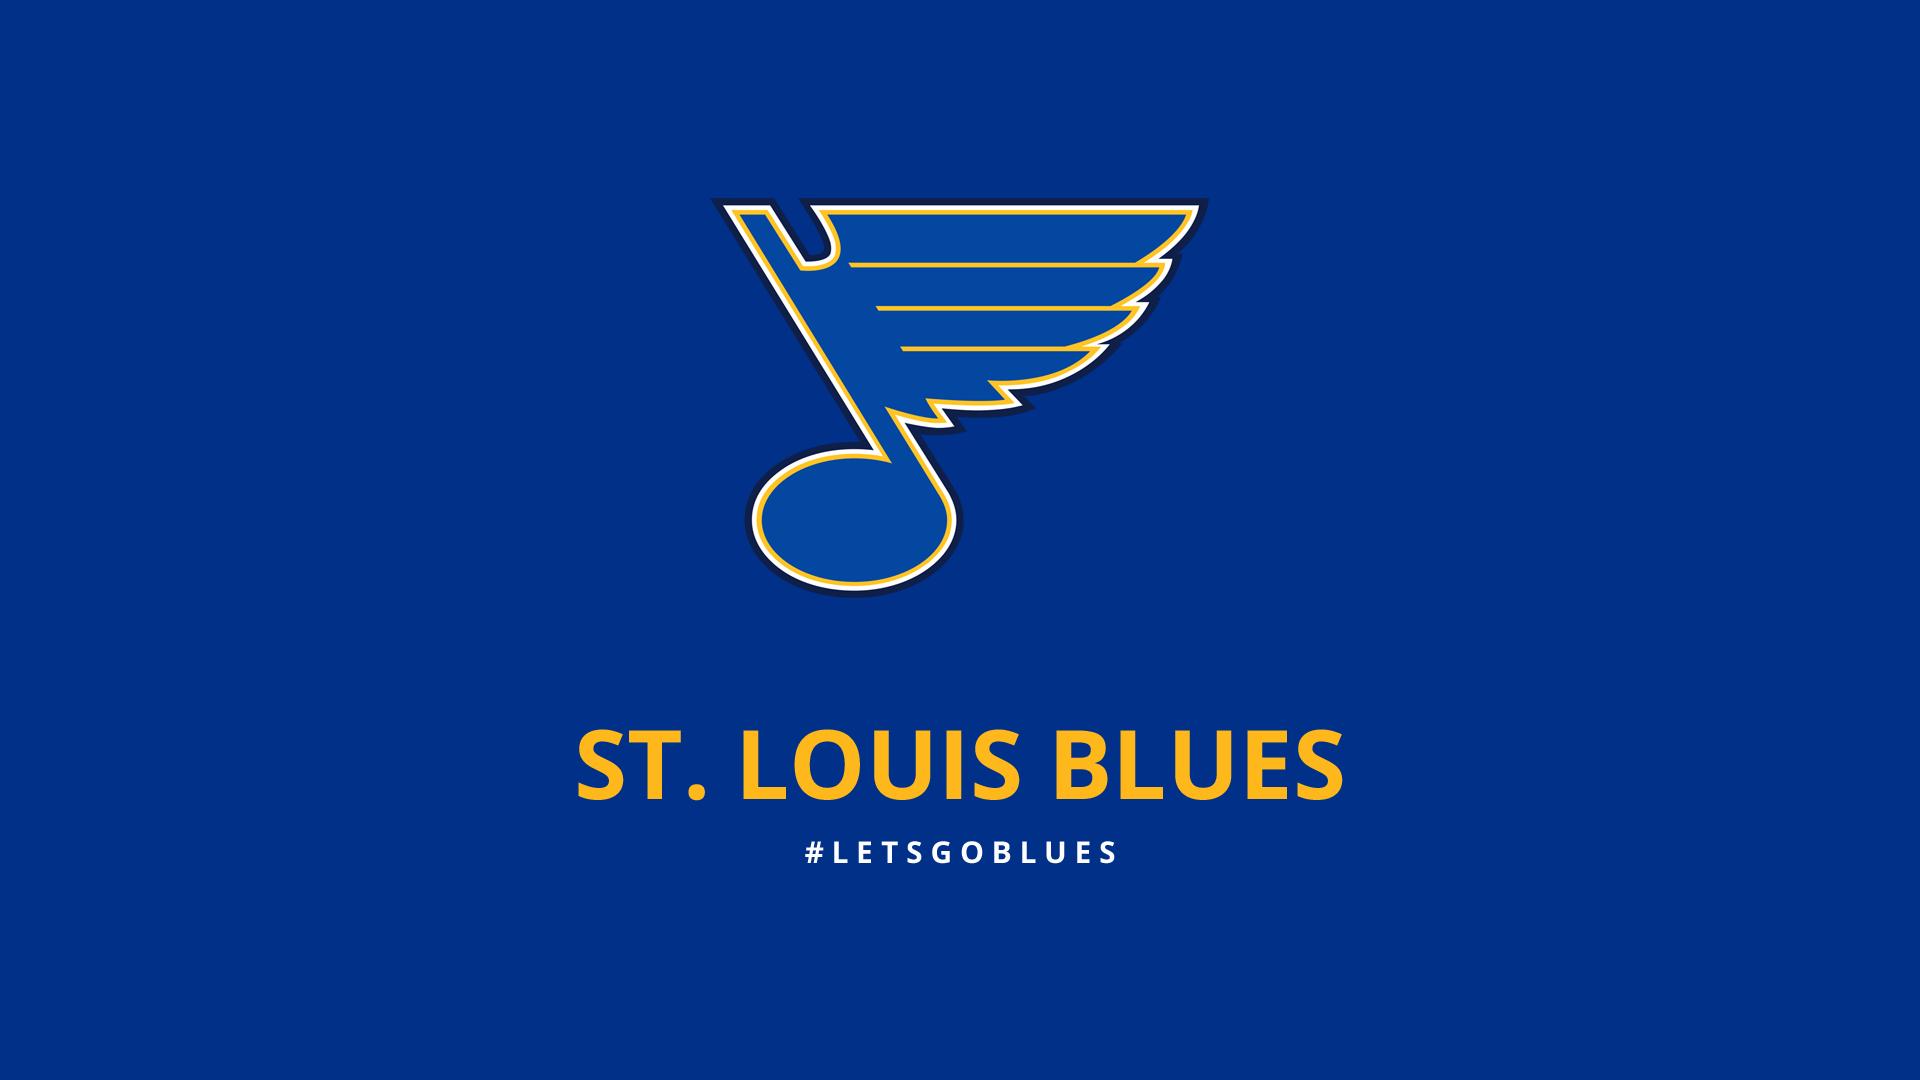 St Louis Blues Iphone Wallpaper St Louis Blues Wallpapers Wallpaper Cave